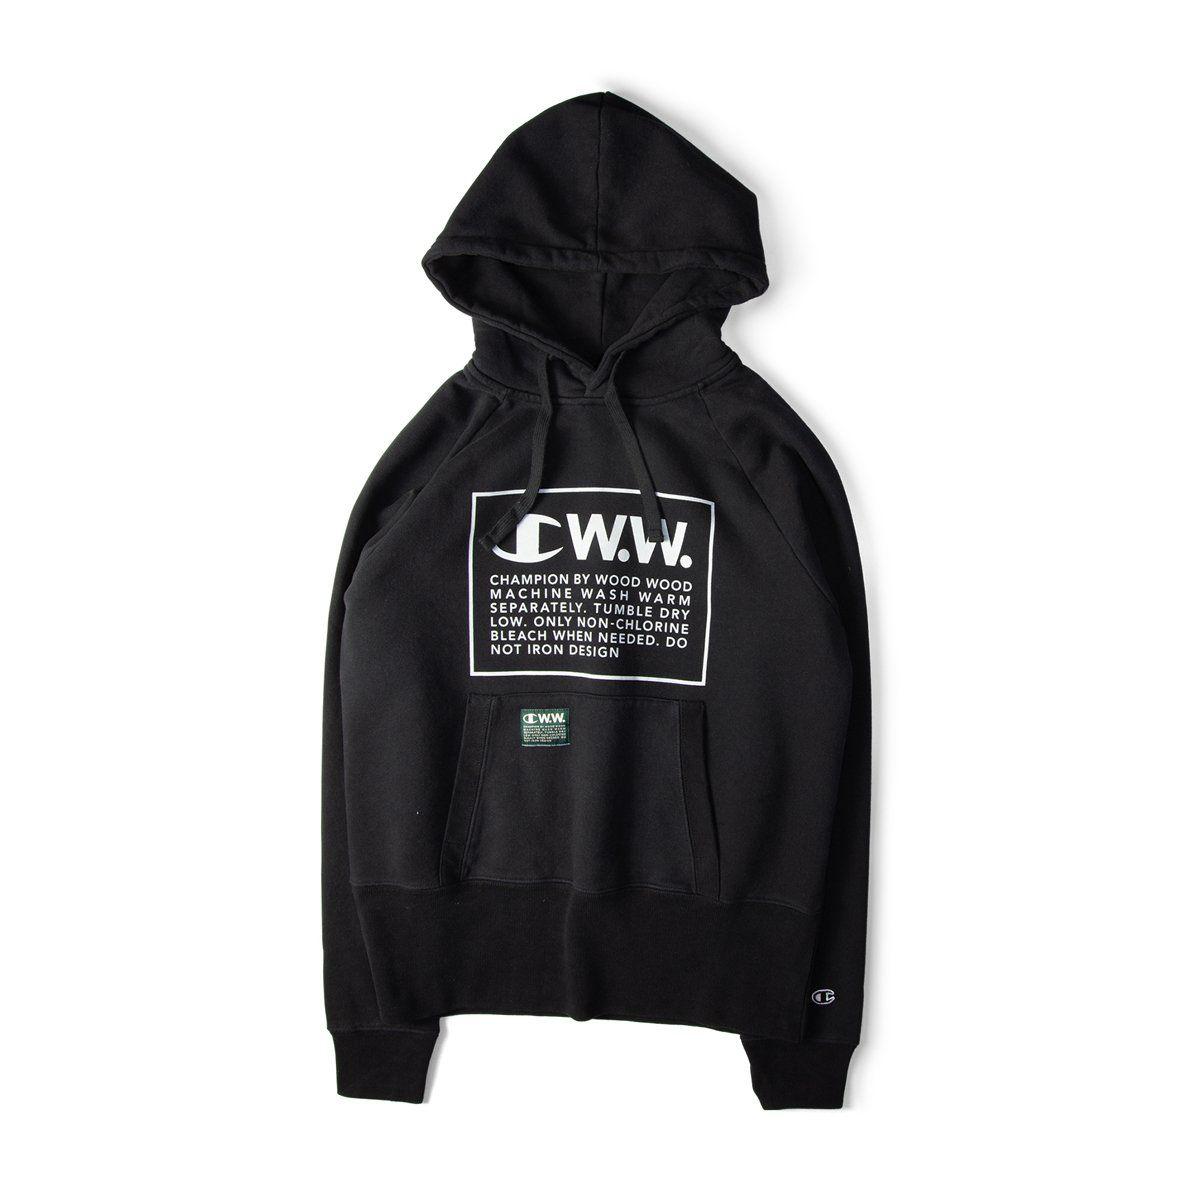 0f32311545ac Champion X Wood Wood Box Logo Hooded Sweatshirt Black Free SHIPPING OVER  £50.00 #1856 #grants1856 #grants